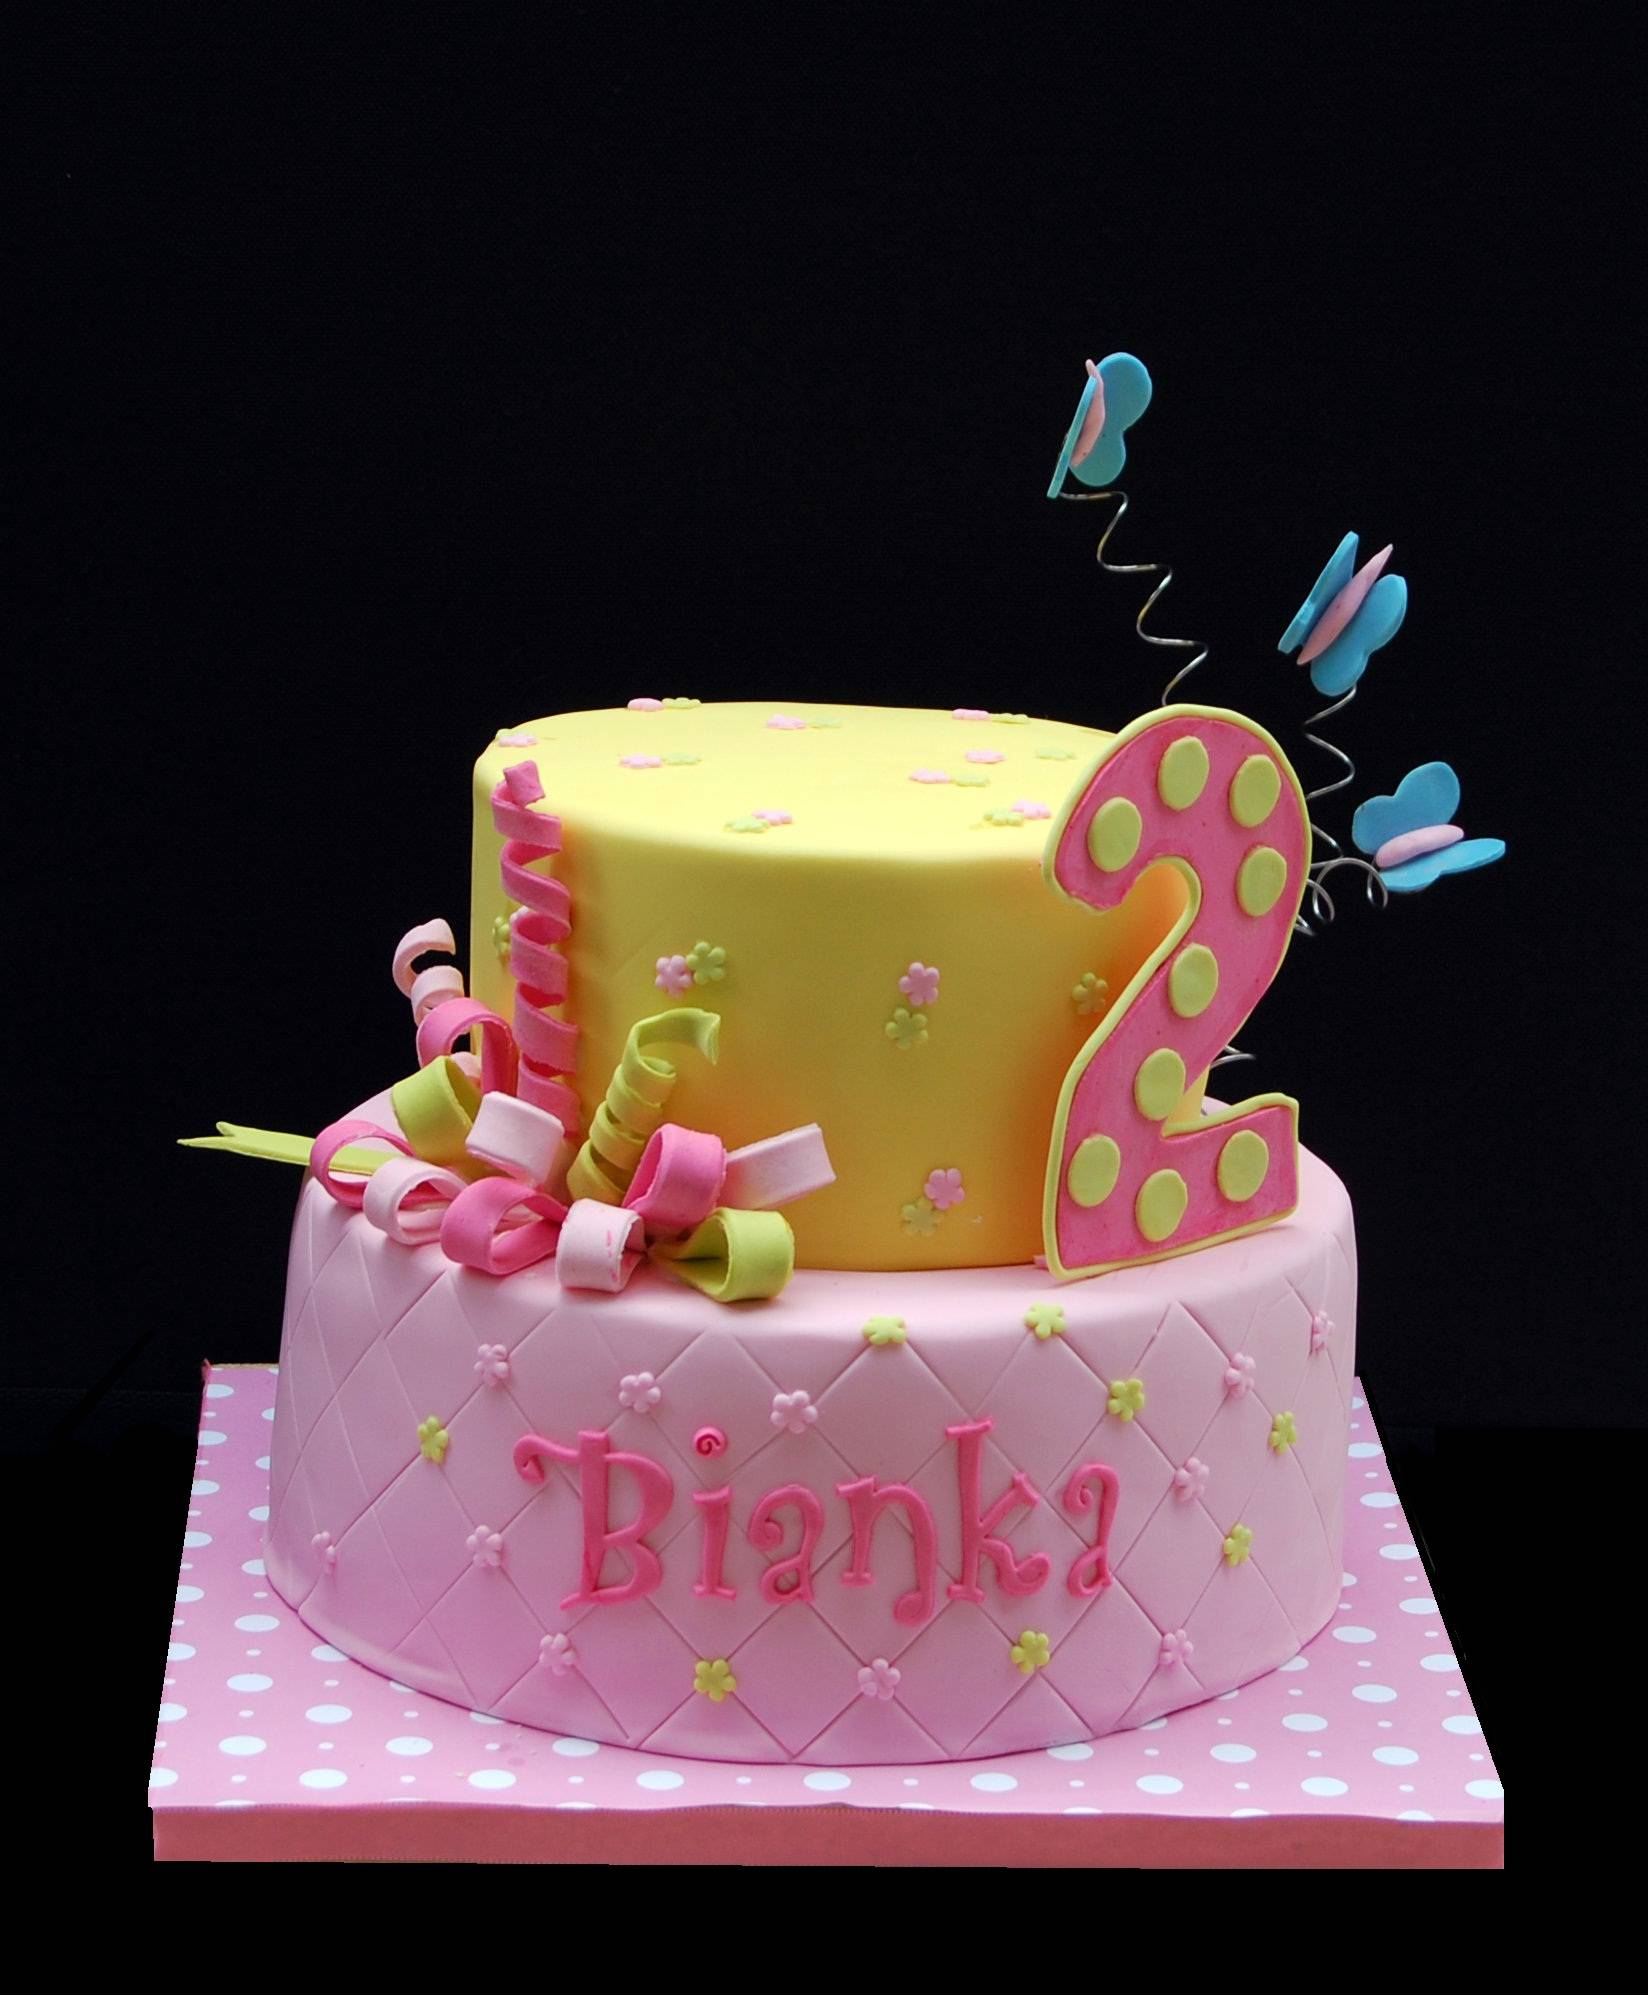 An adorable cake for an adorable 2 yr old